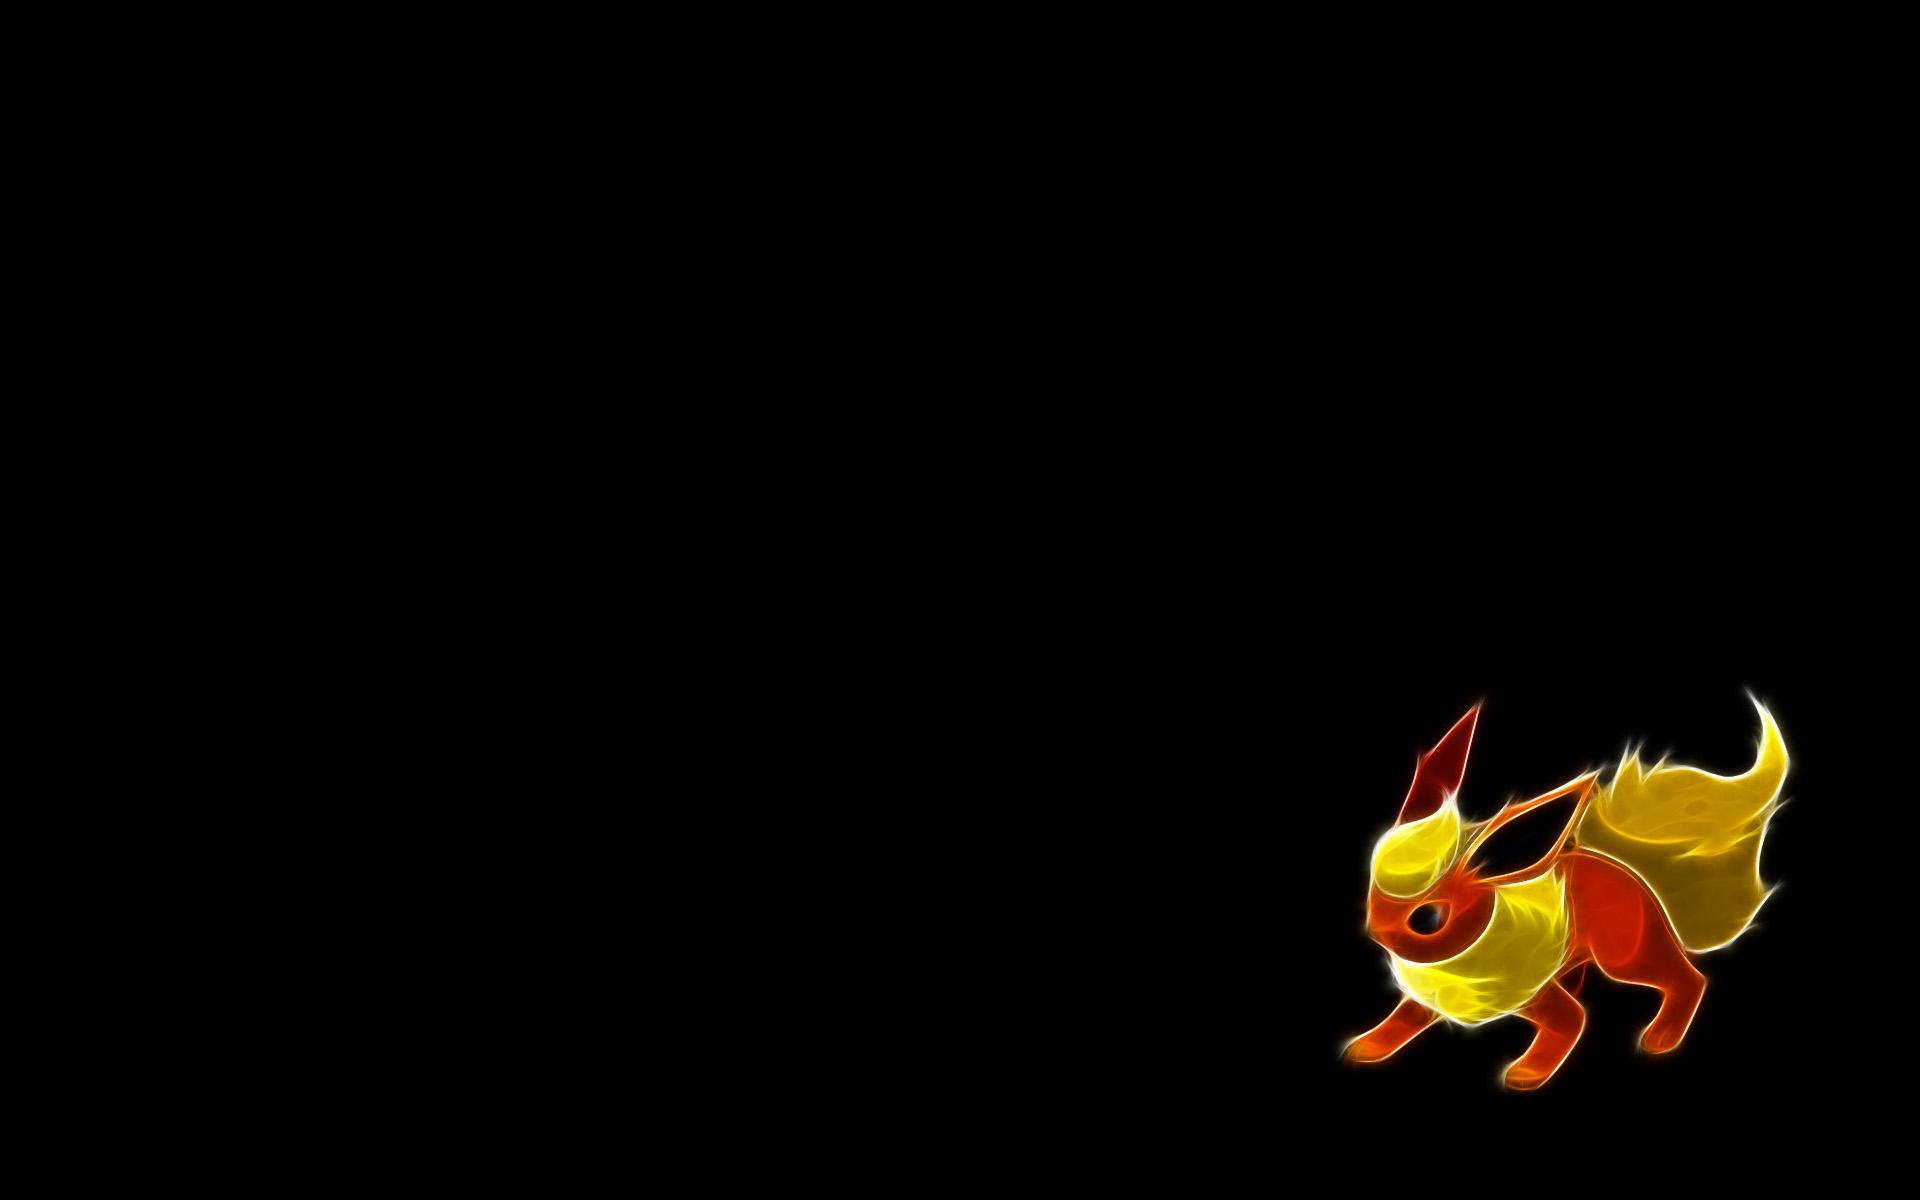 Pokémon HD Wallpaper | Background Image